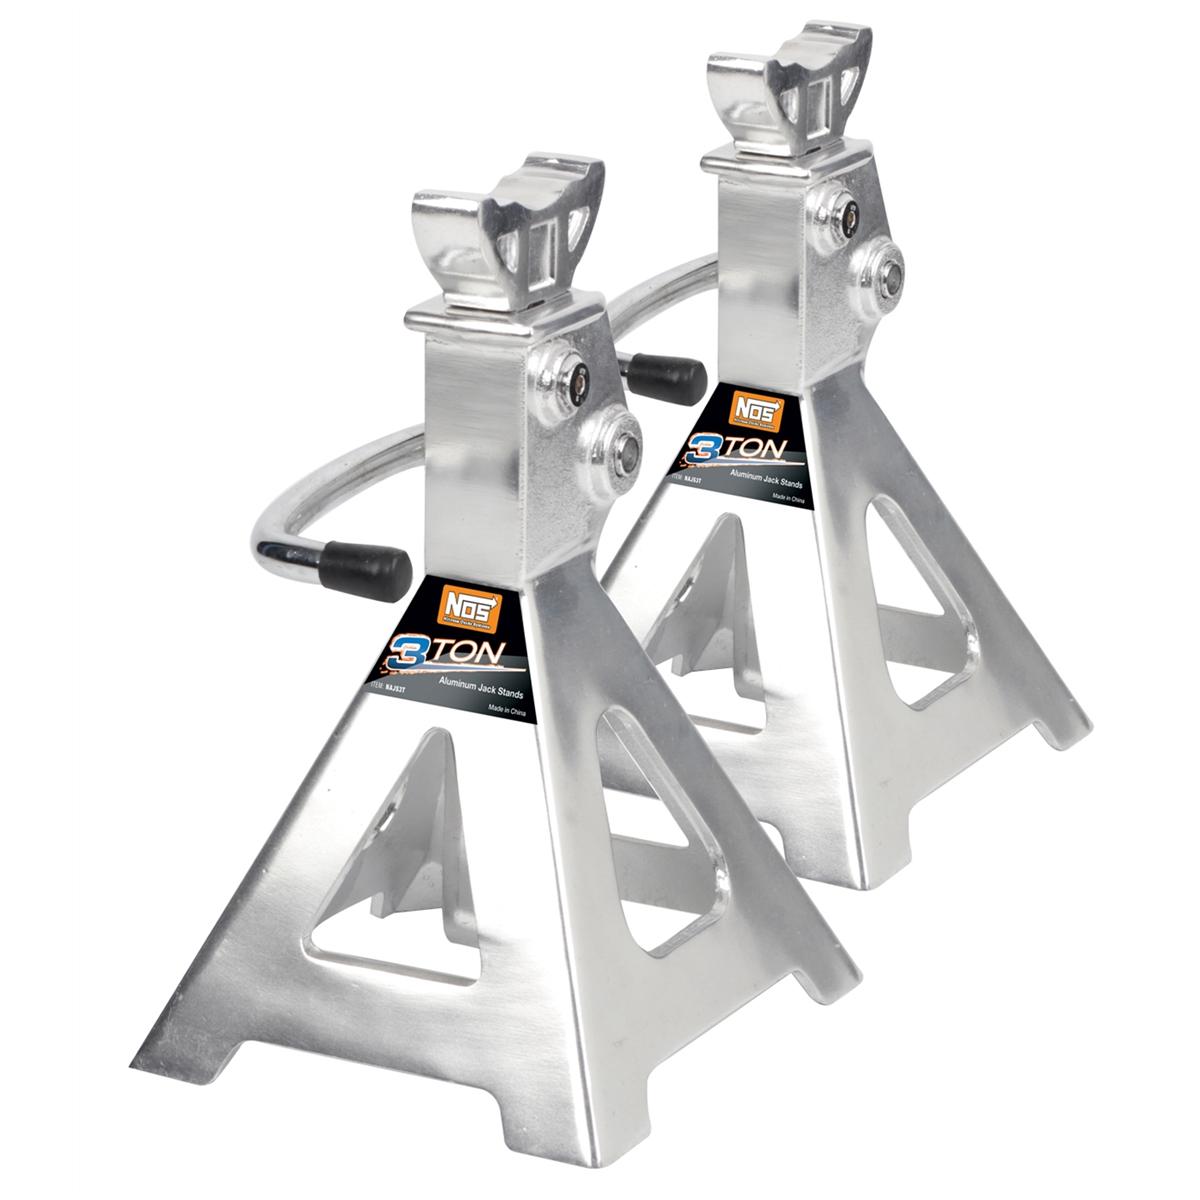 Jack Stand Ratchet Style 3 Ton Aluminum